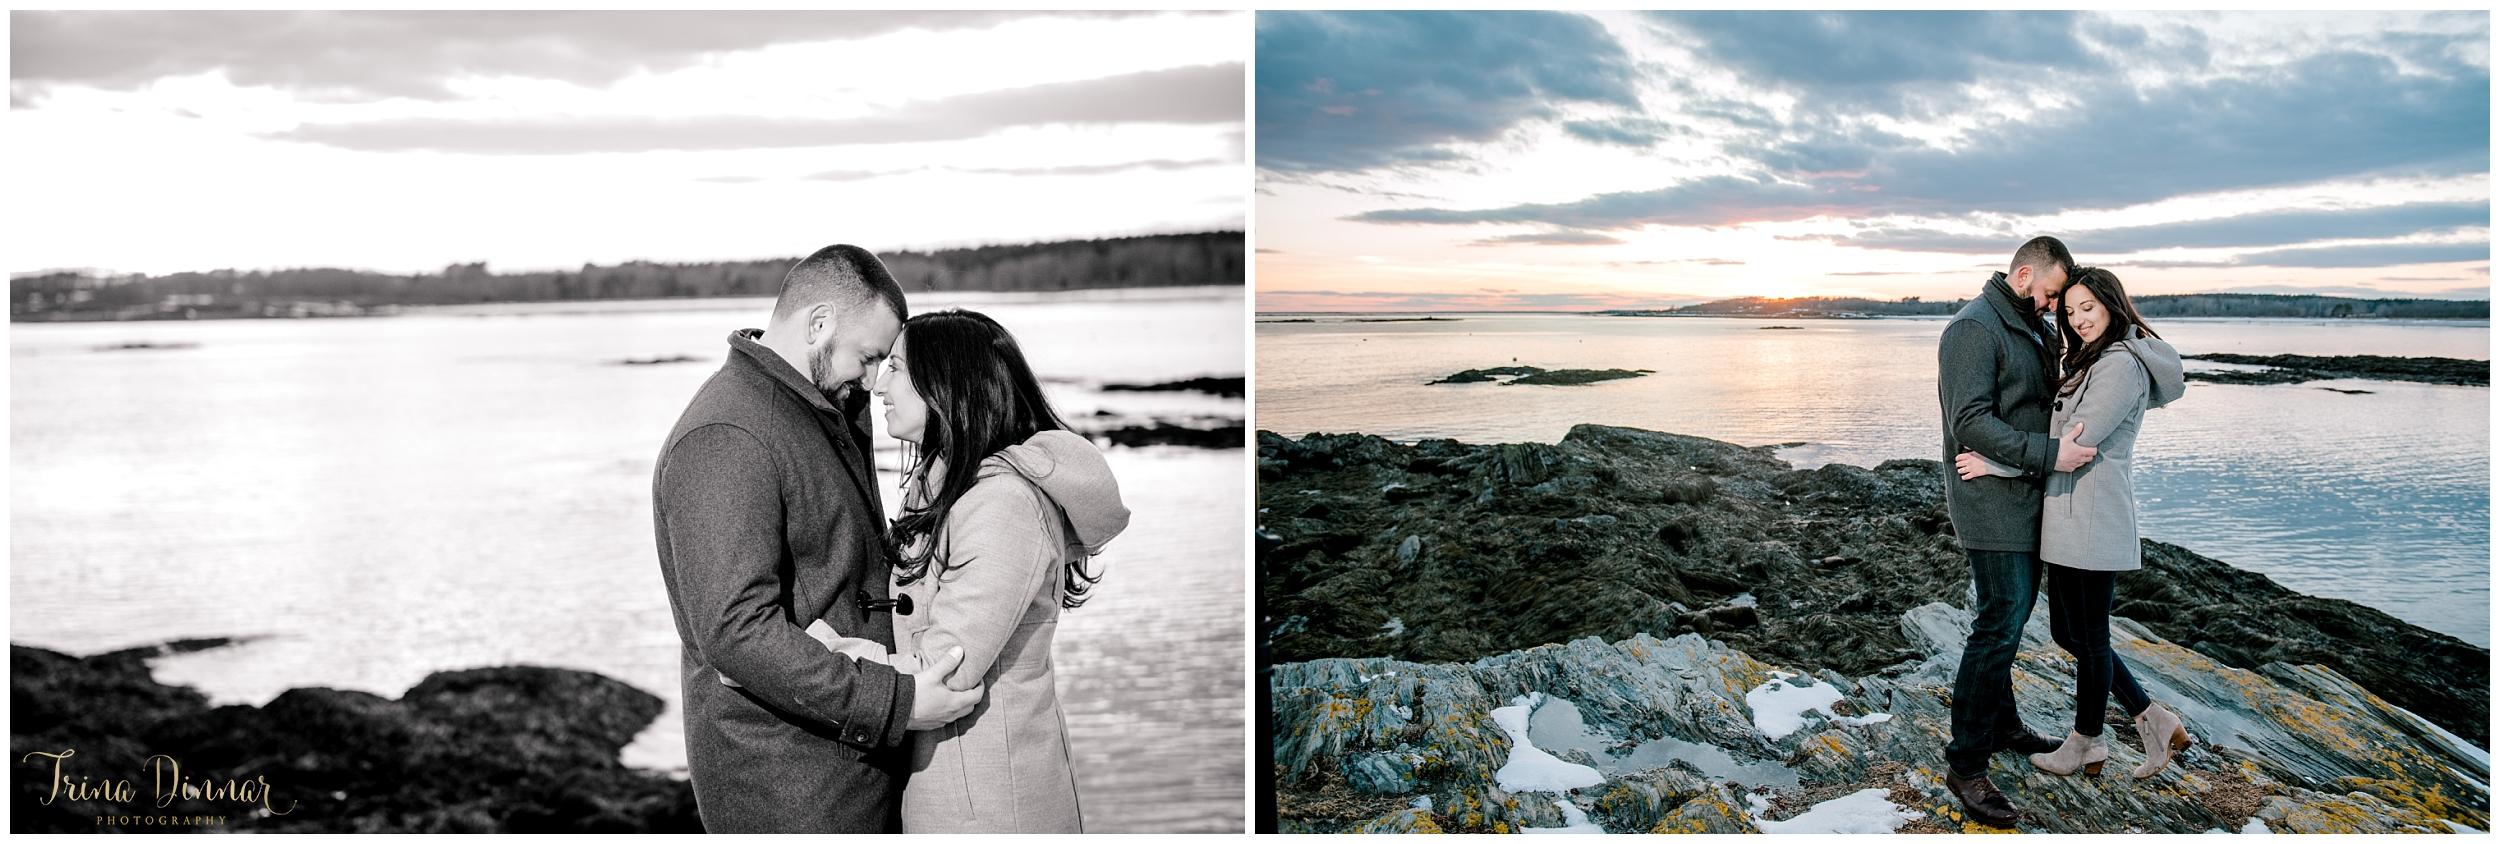 Photographers in Portland Maine capture coastal couples portraits.